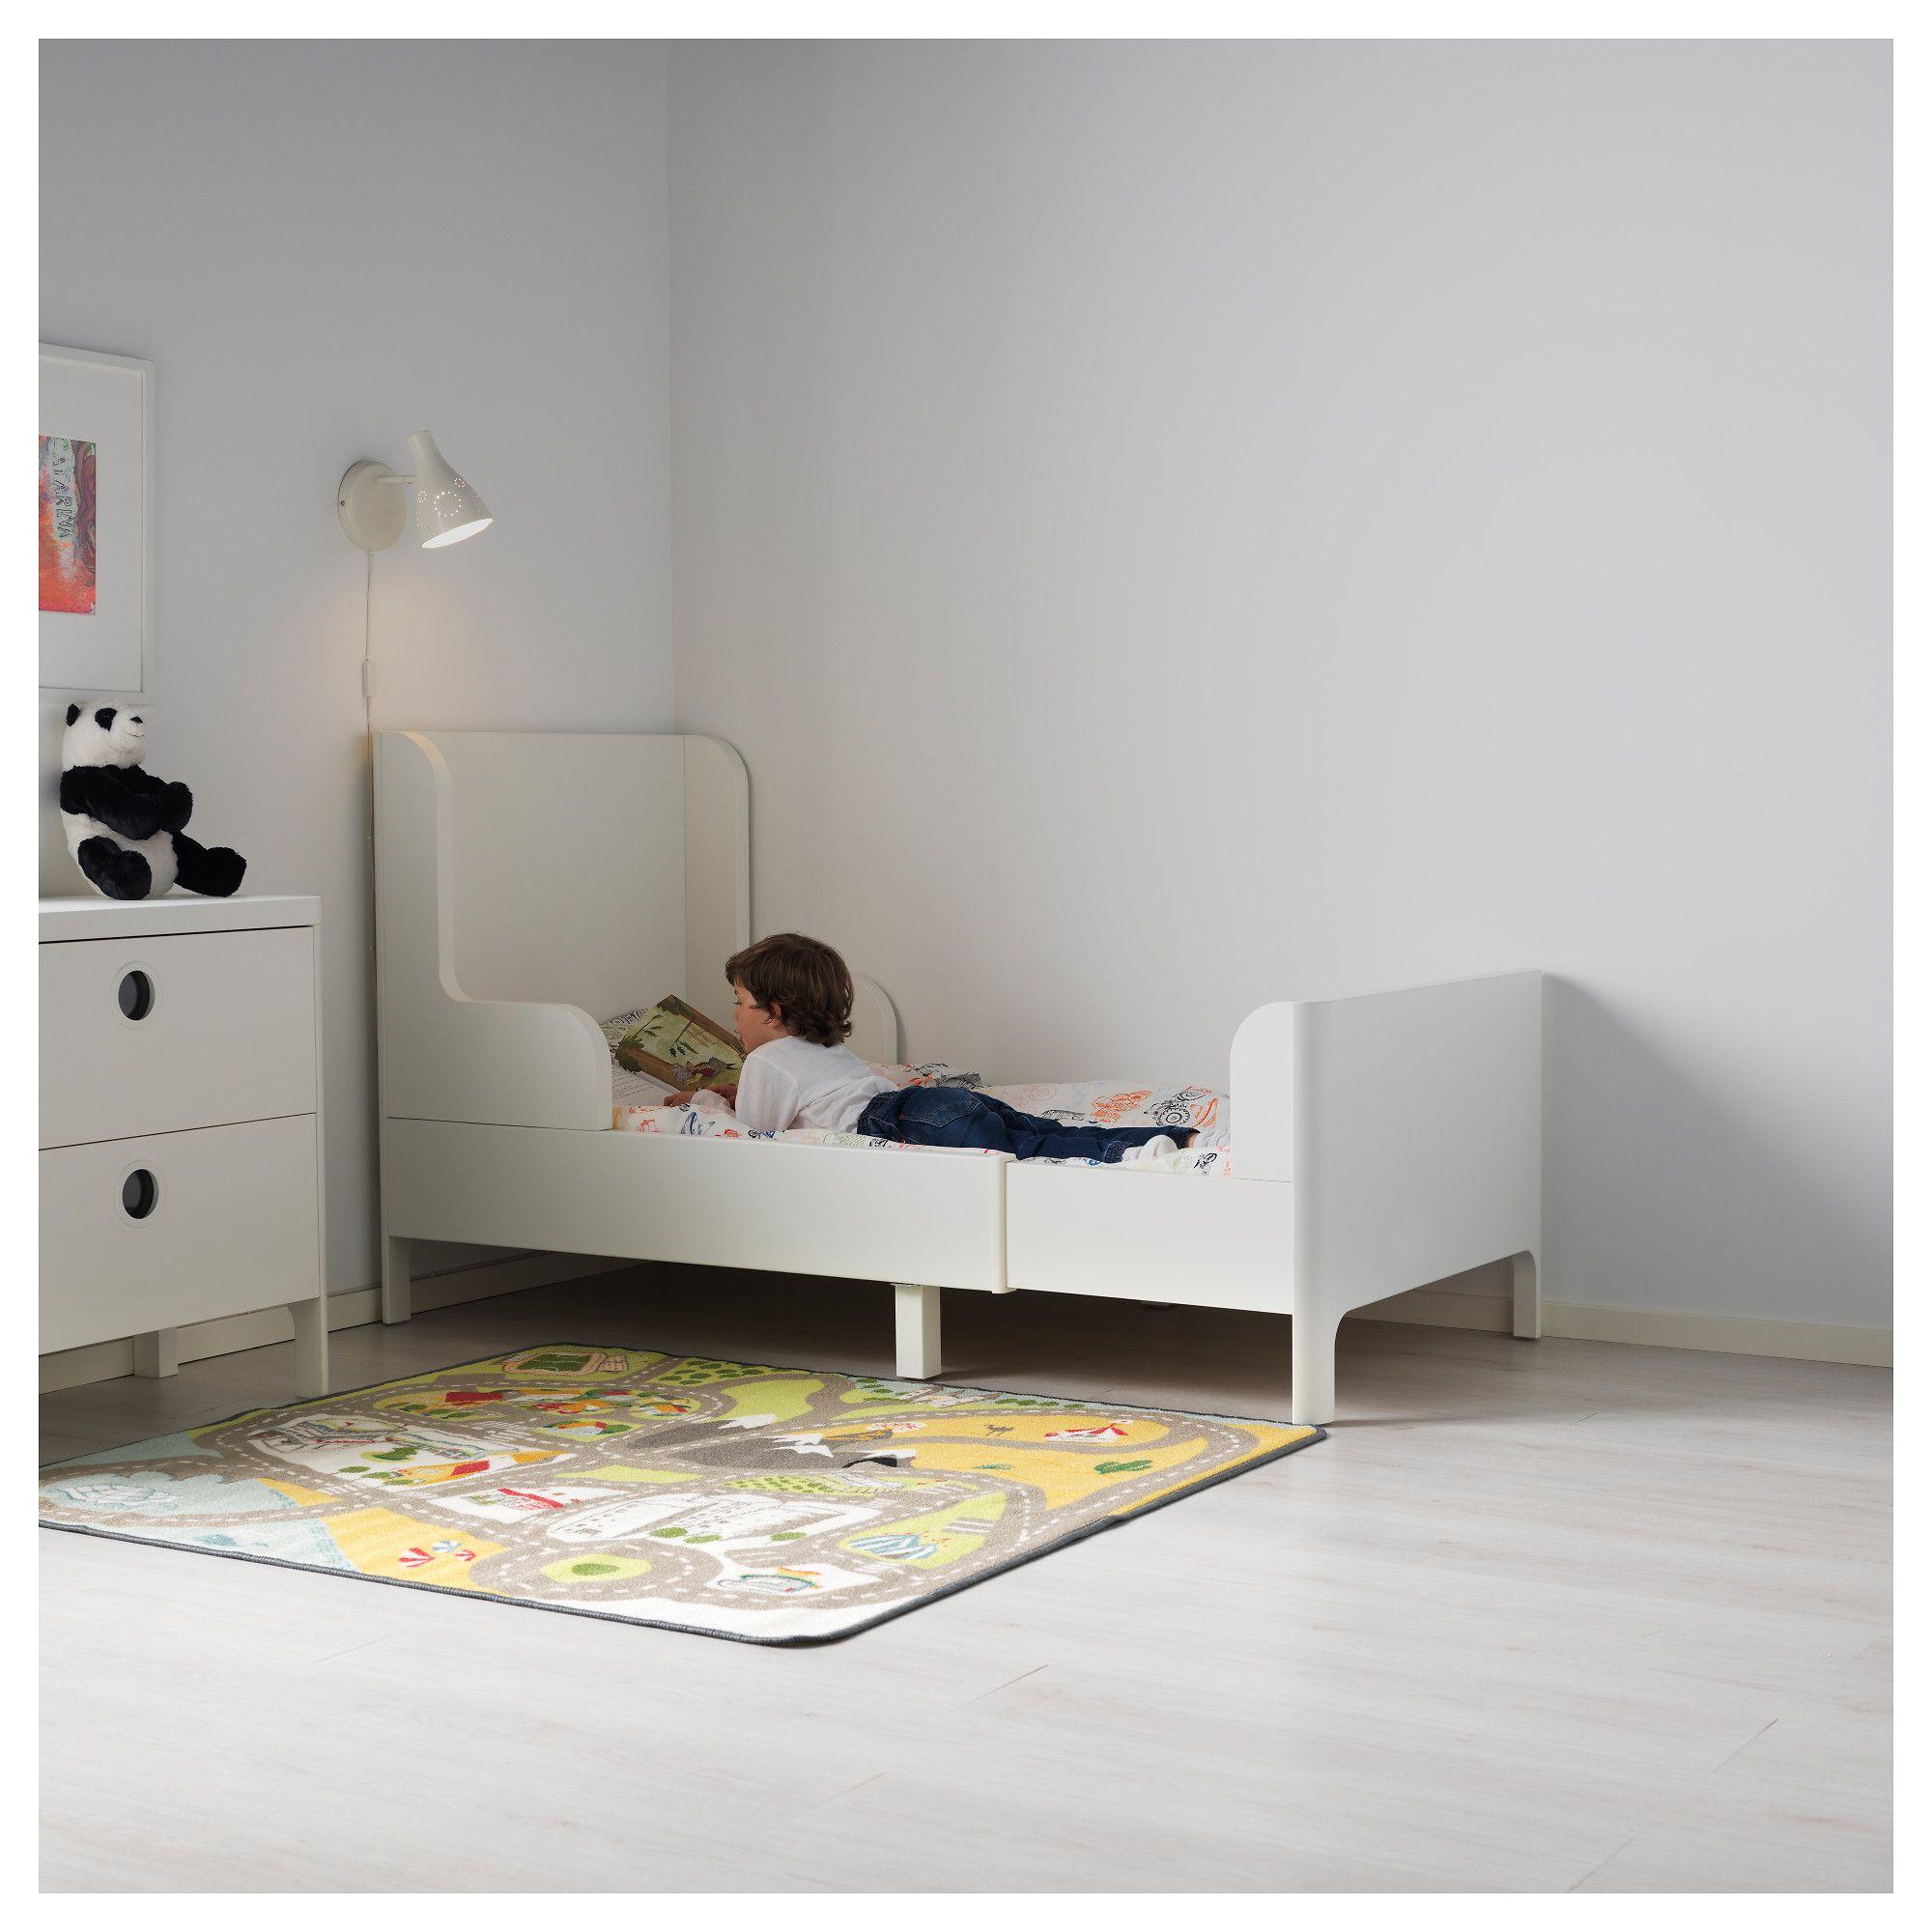 Furniture and Home Furnishings | Ikea bed, Ikea kids bed ...